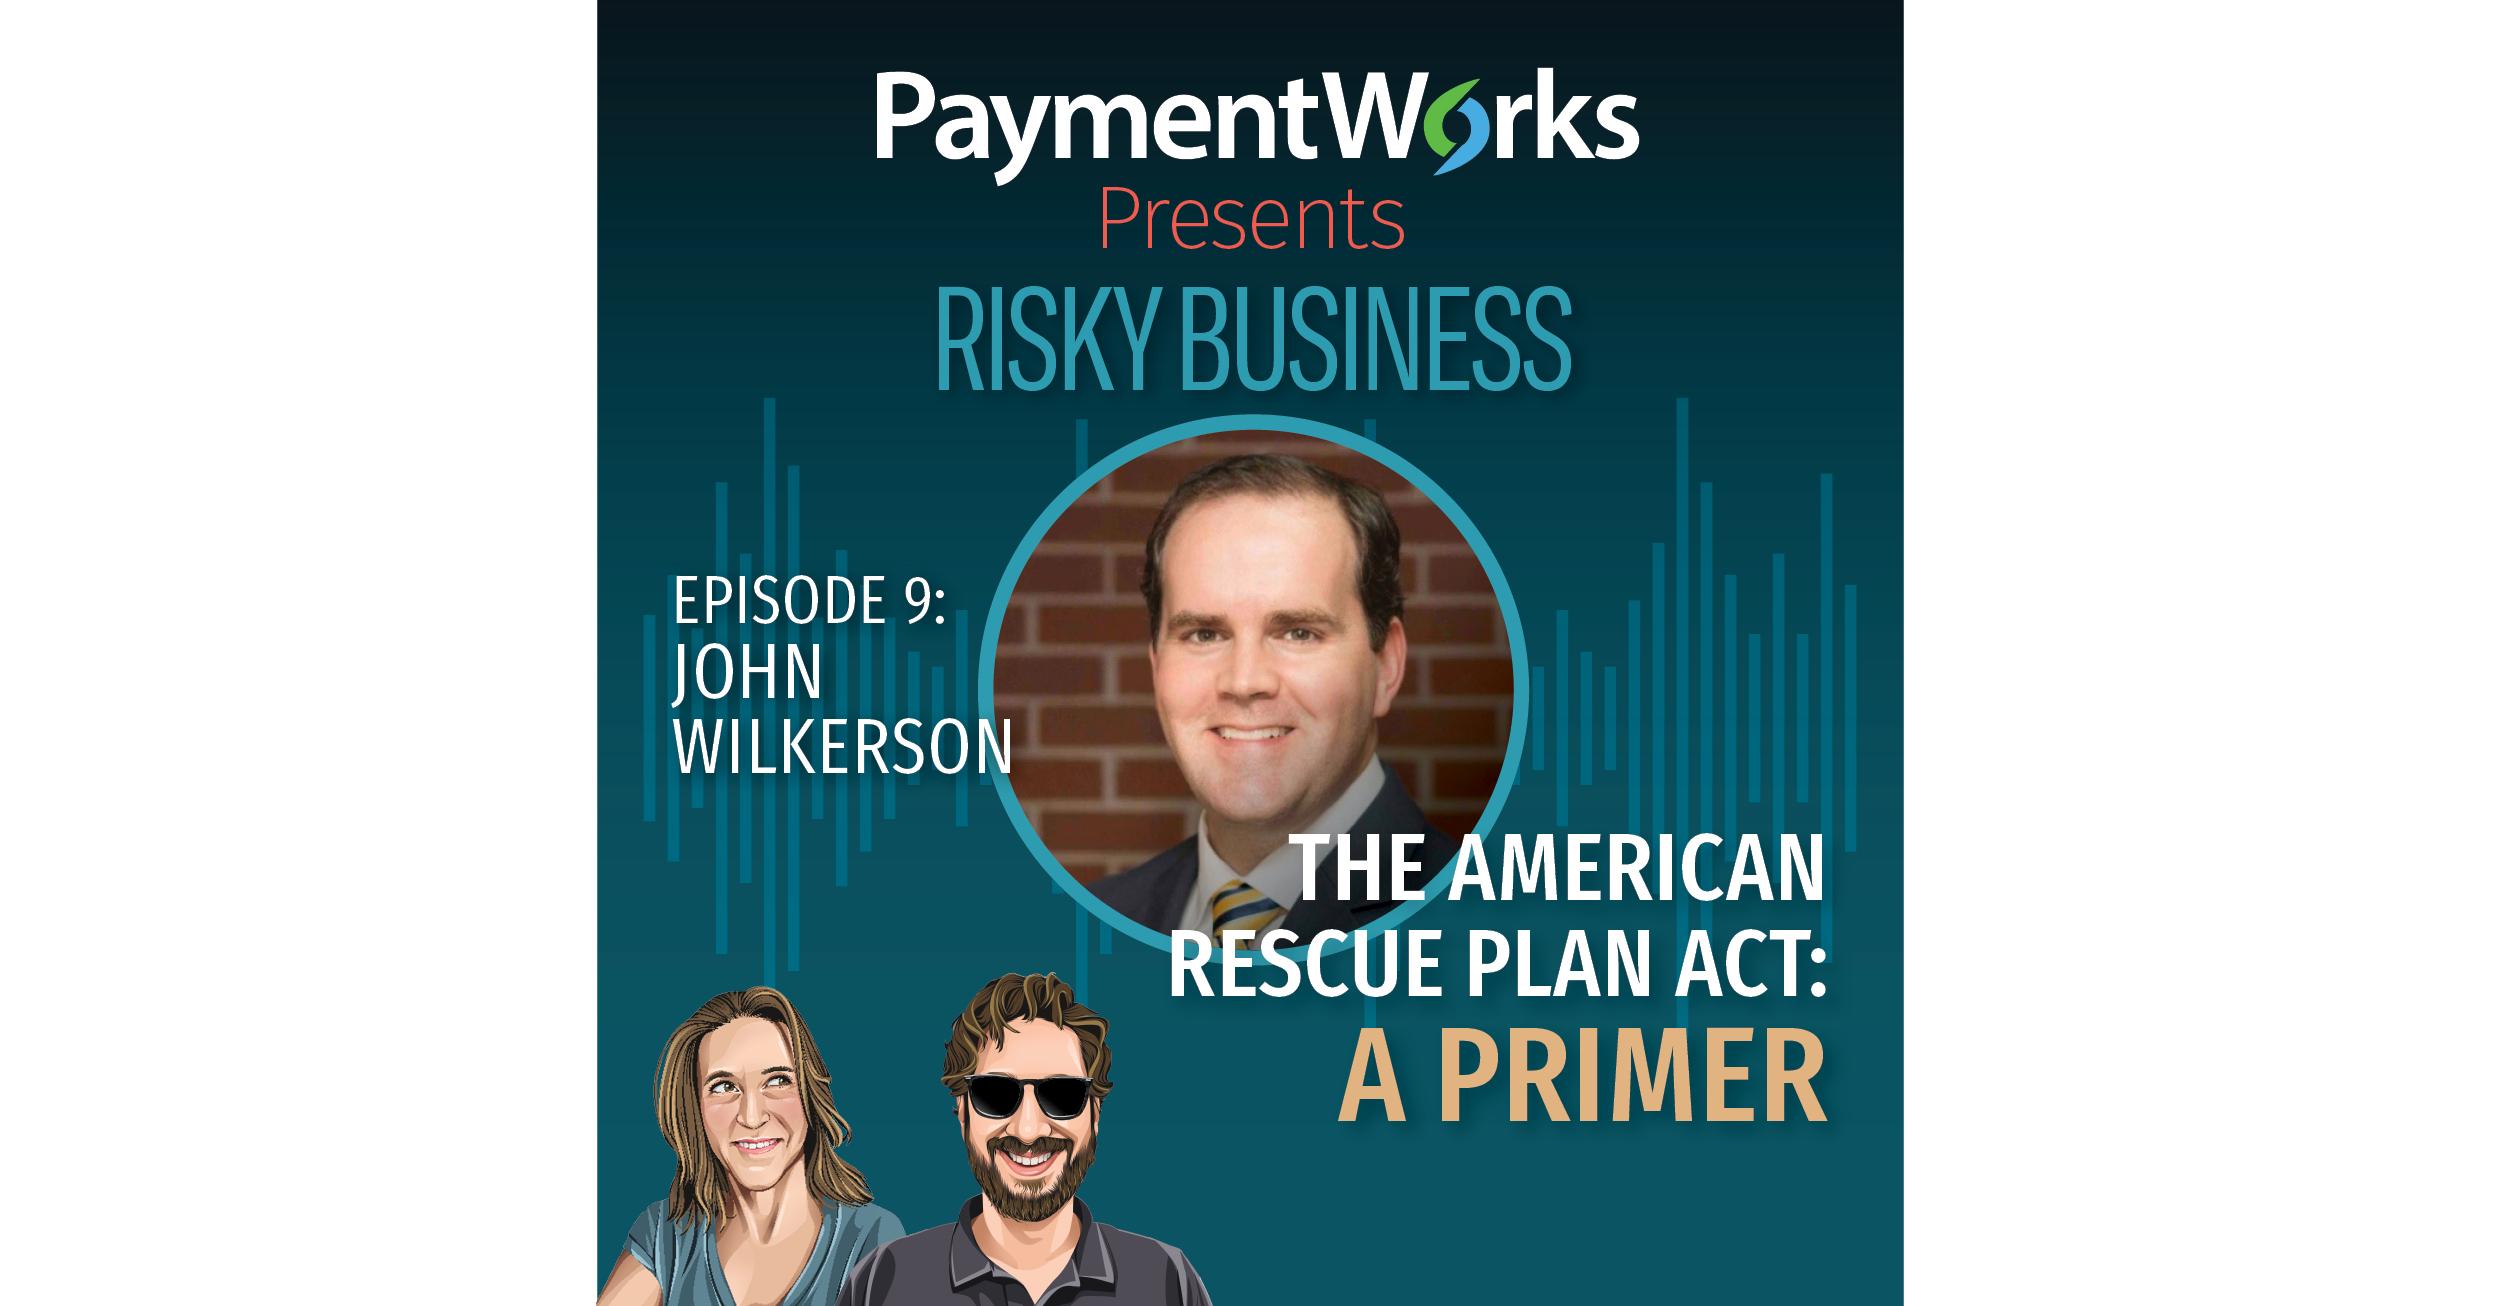 Risky Business podcast Episode 9 art. Guest John Wilkerson